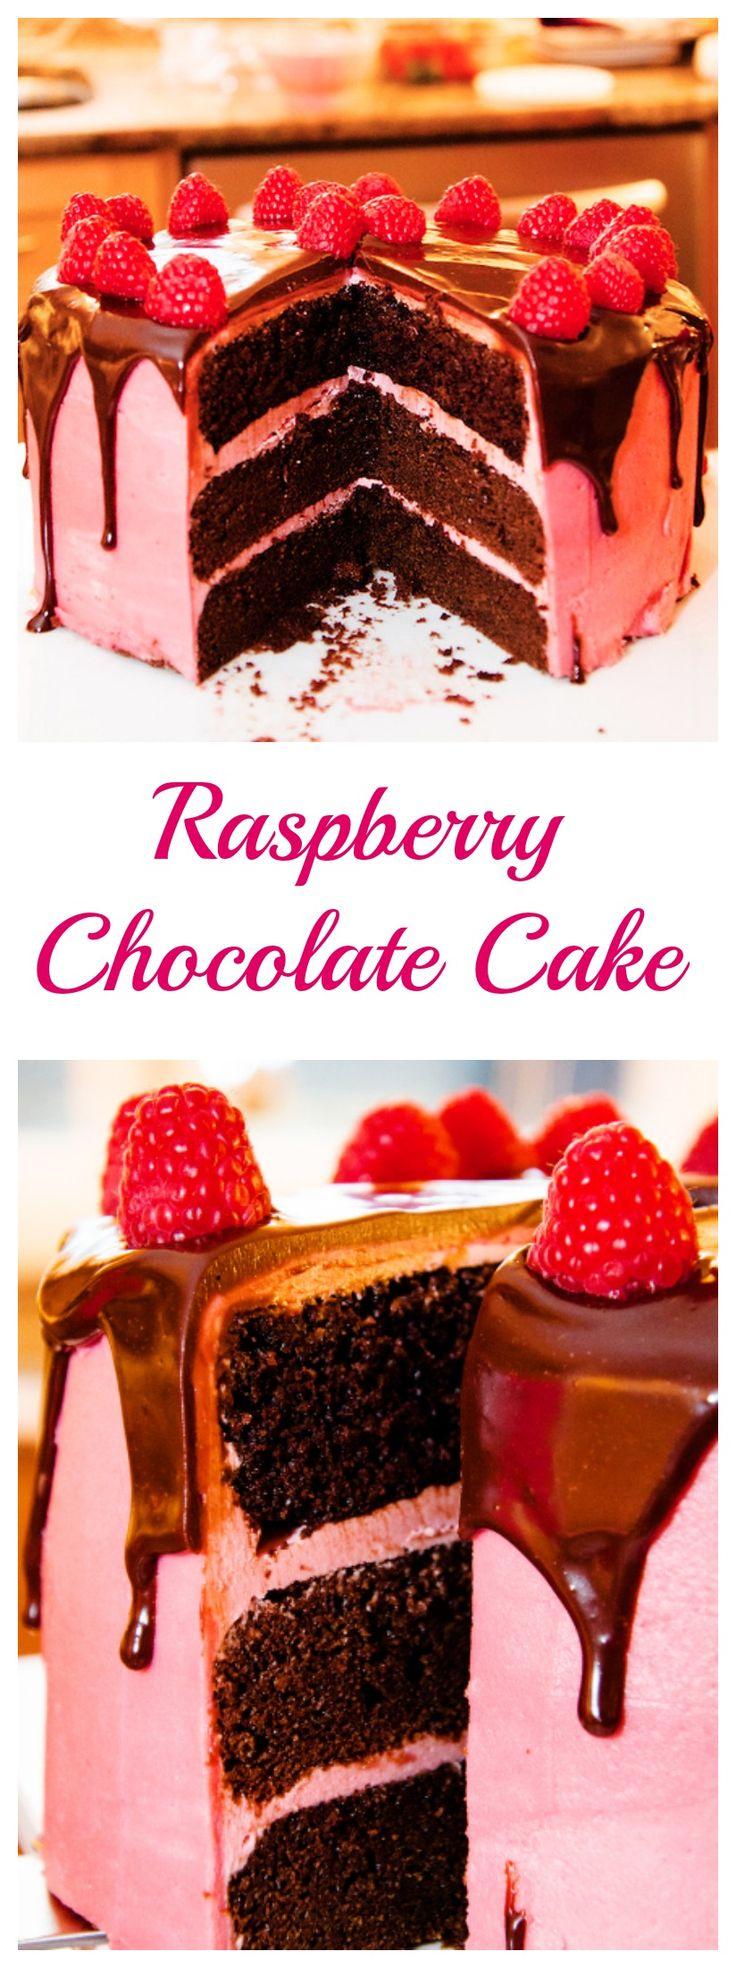 Raspberry Chocolate Cake | Grandbaby Cakes